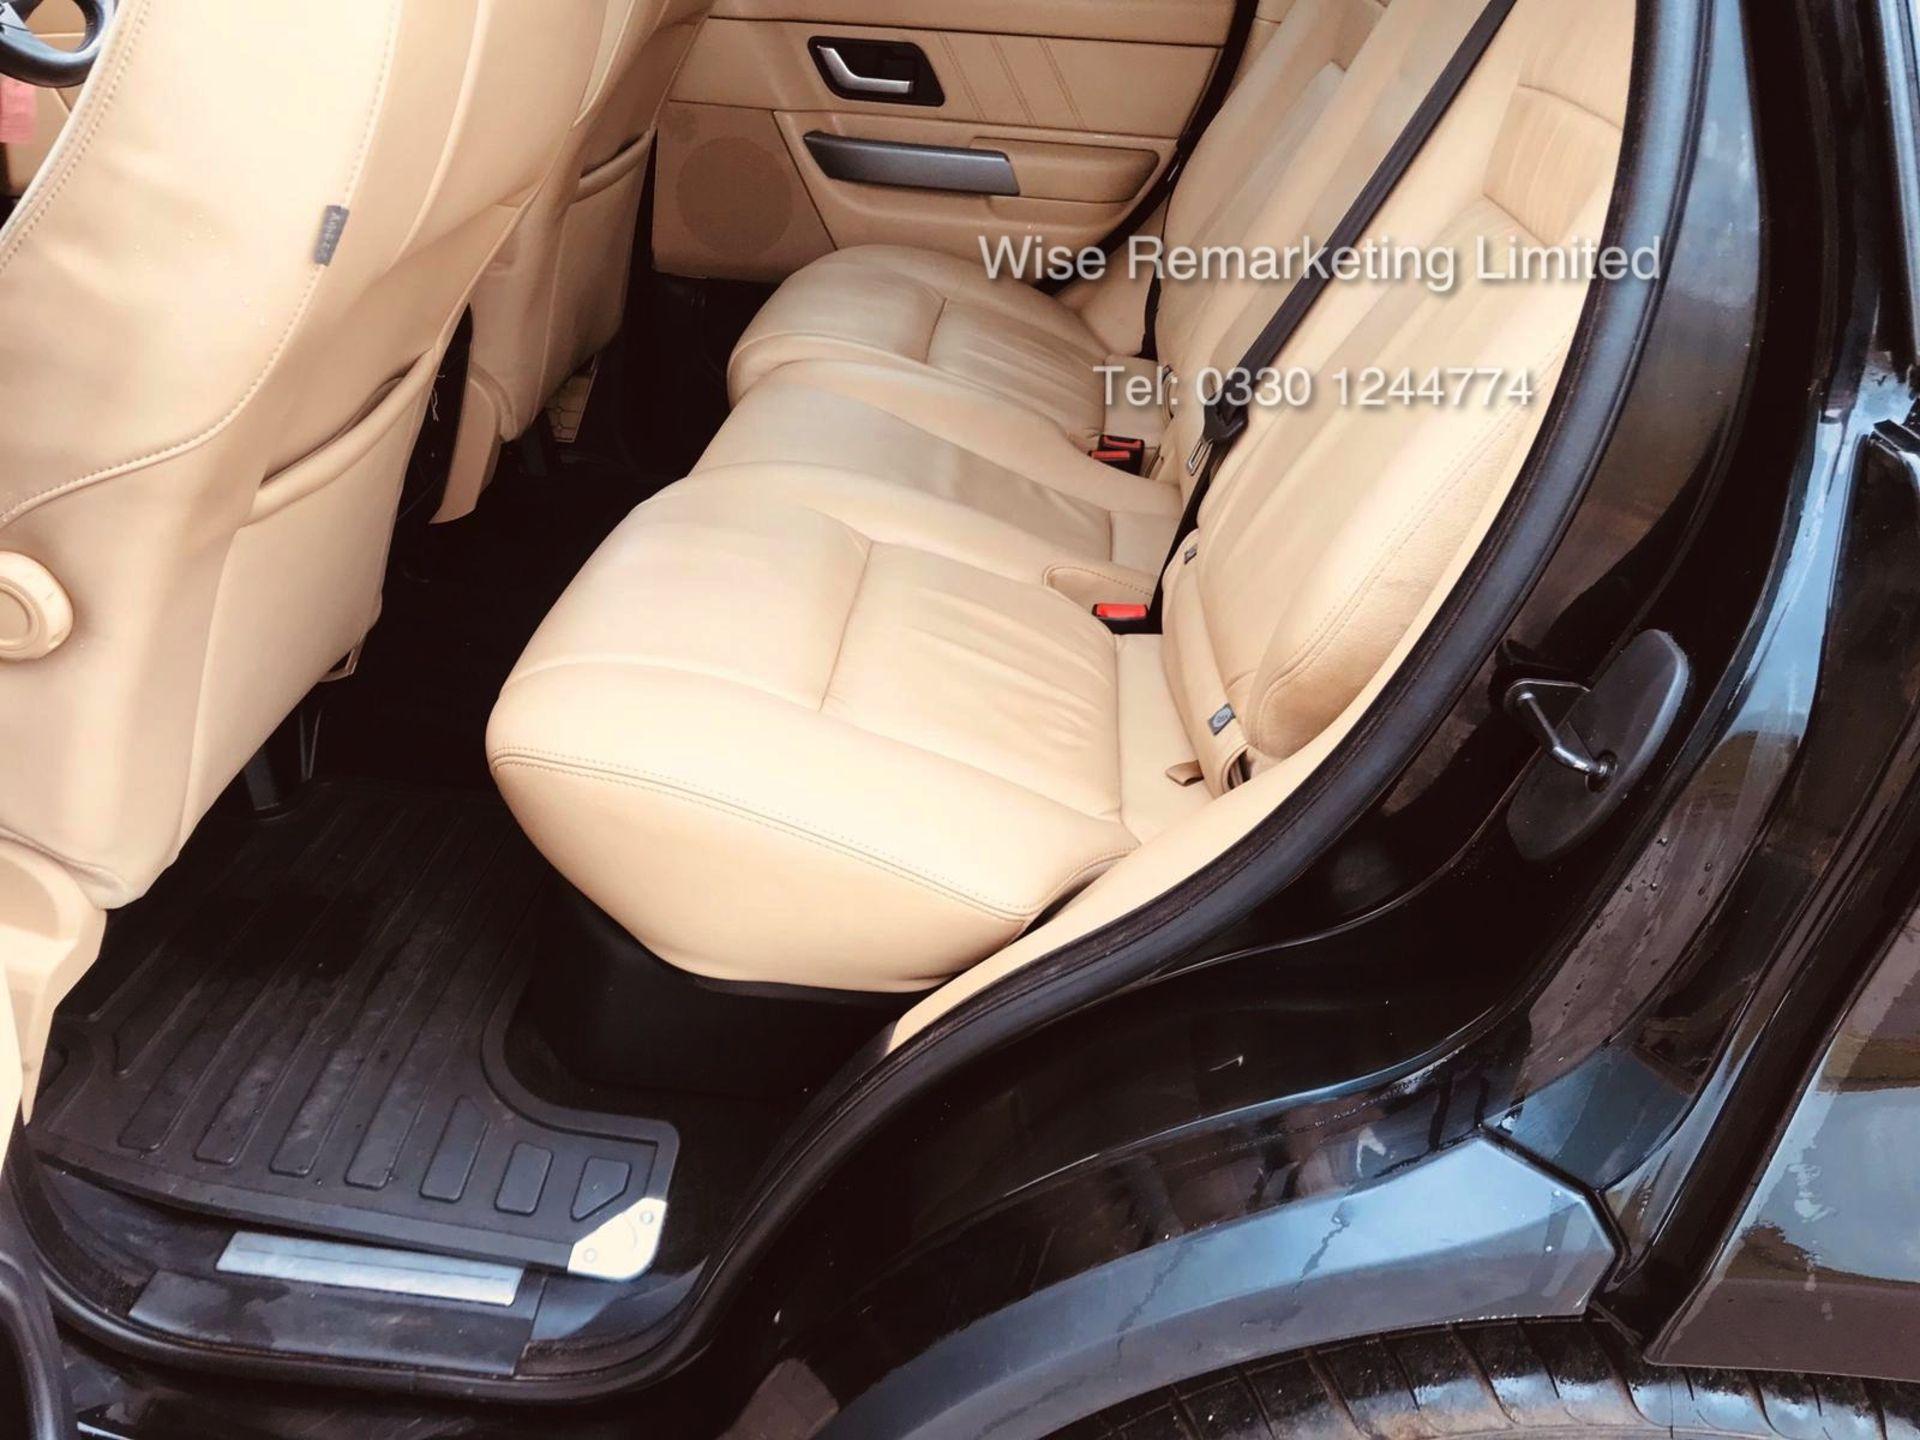 Range Rover Sport 2.7 TDV6 HSE Auto - 2008 Model - Cream Leather - Sat Nav - Heated Seats - Image 7 of 19